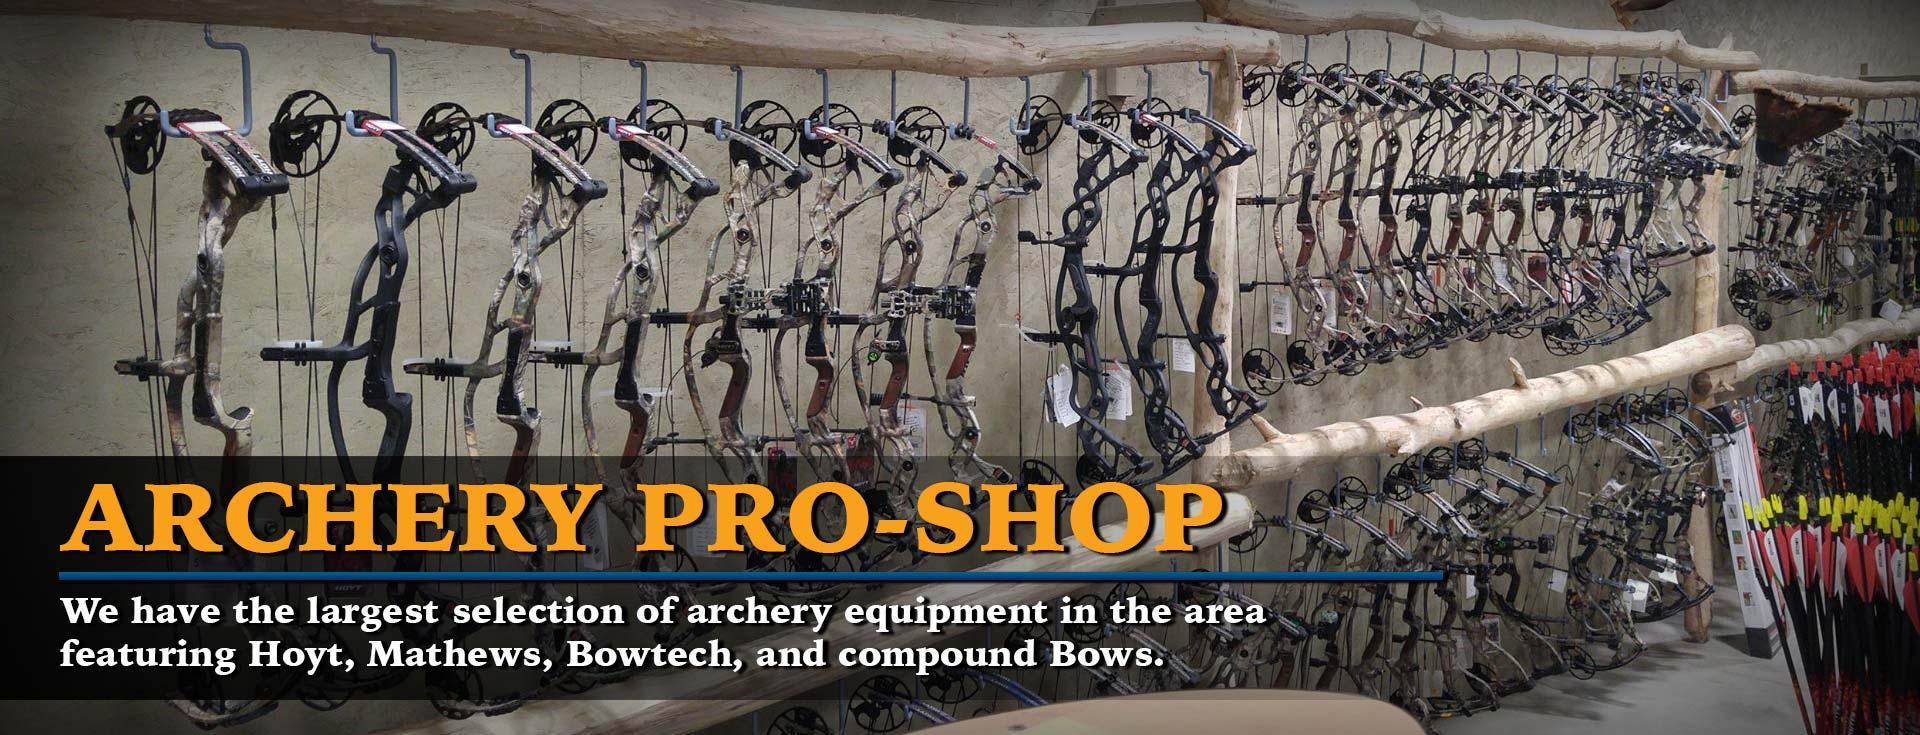 Hunting & Fishing Supplies Bettendorf IA | Archery, Bows, Crossbows